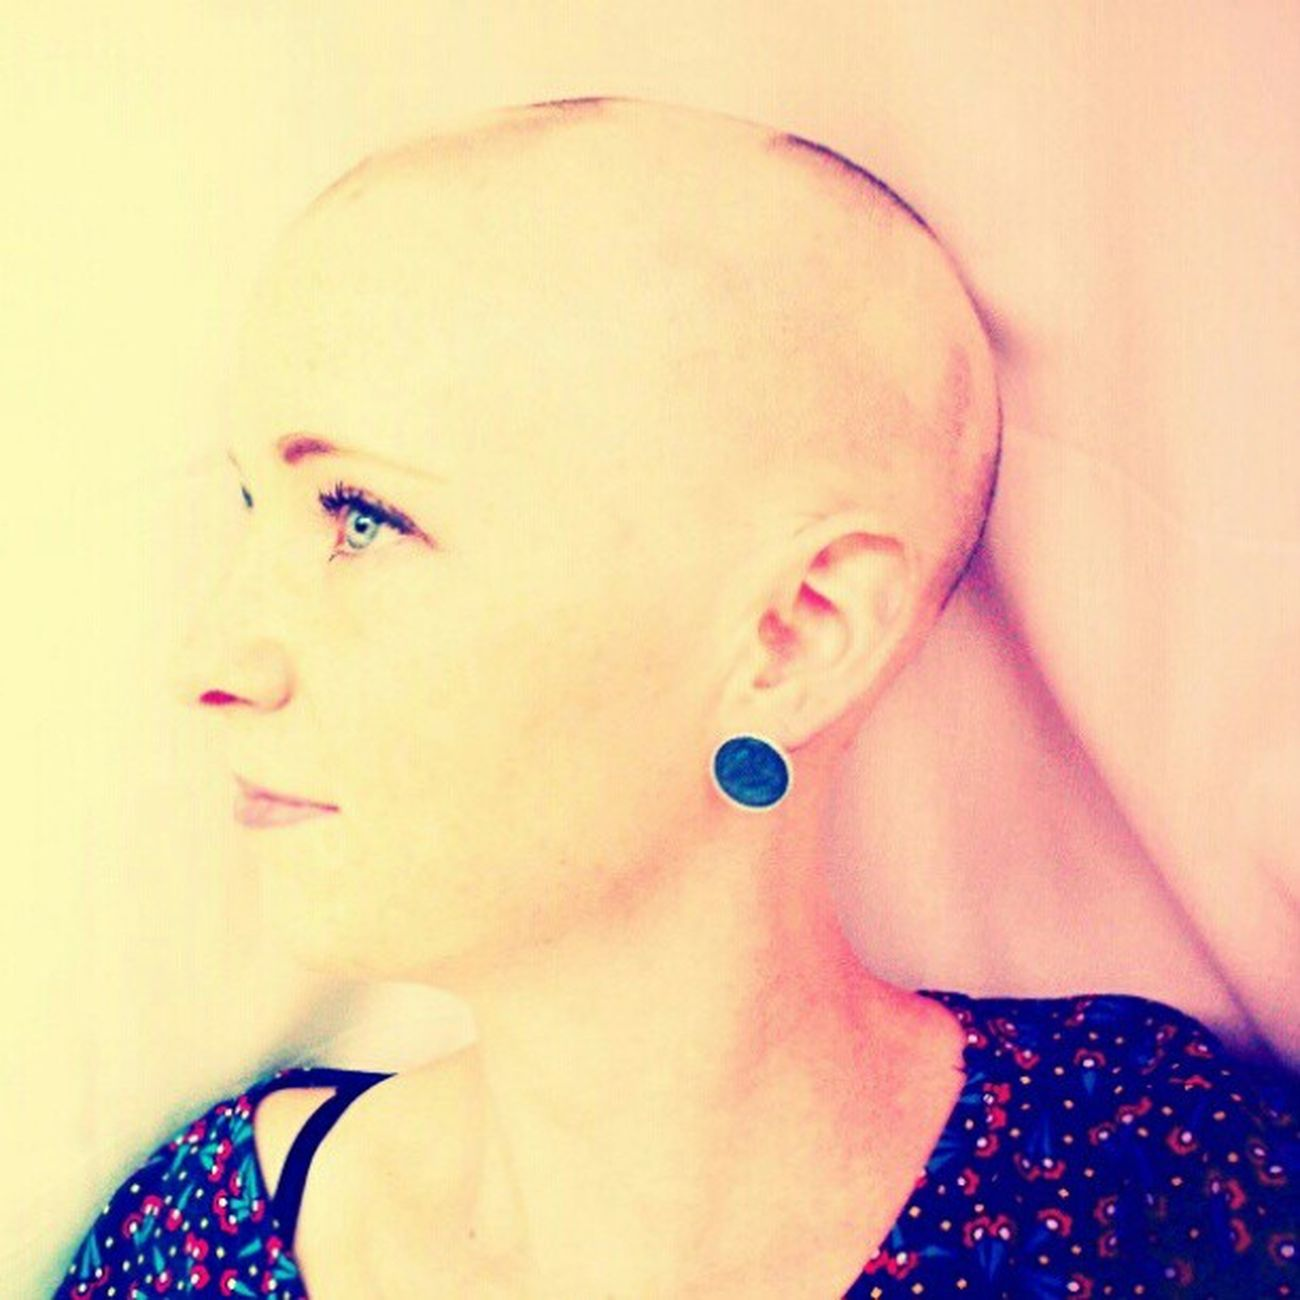 Found another alopecia pic. Alopeciaawareness Alopecia Alopeciaareata Aa nohairdontcare baldandbeautiful bald baldgirl